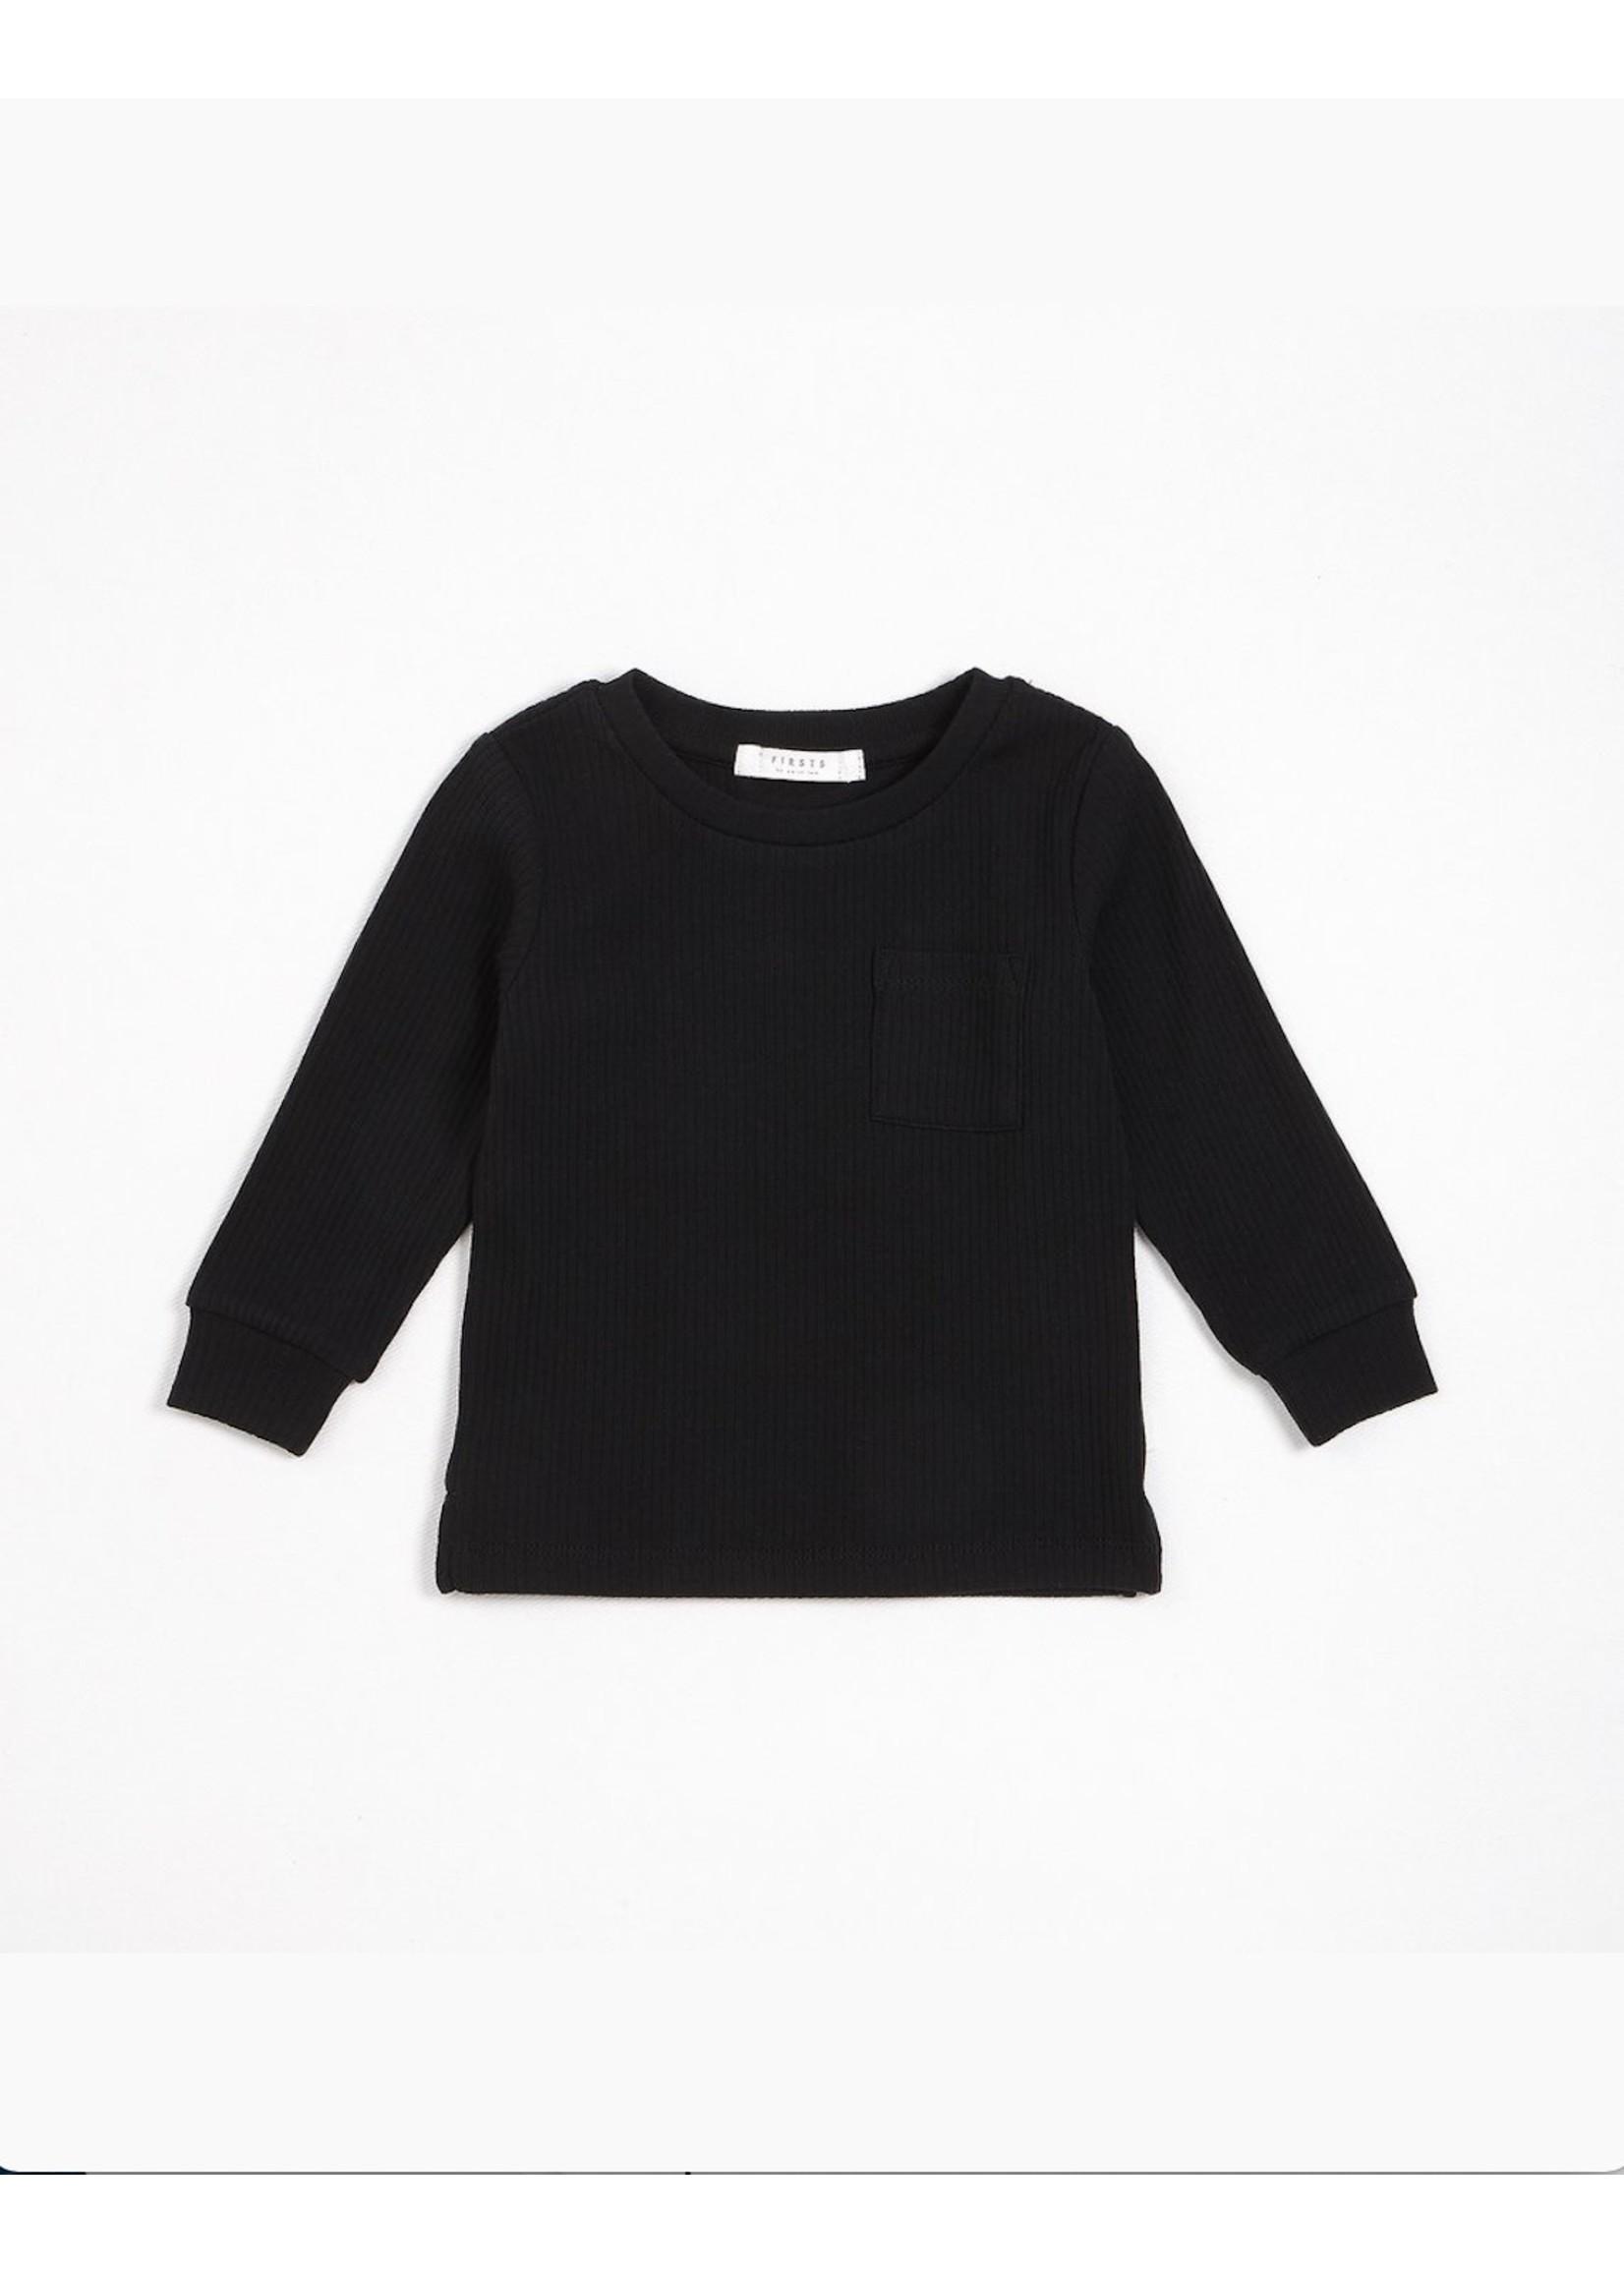 Petit Lem Petit Lem, Caviar Black Modal Rib Long-Sleeve T-Shirt (NB-24M)